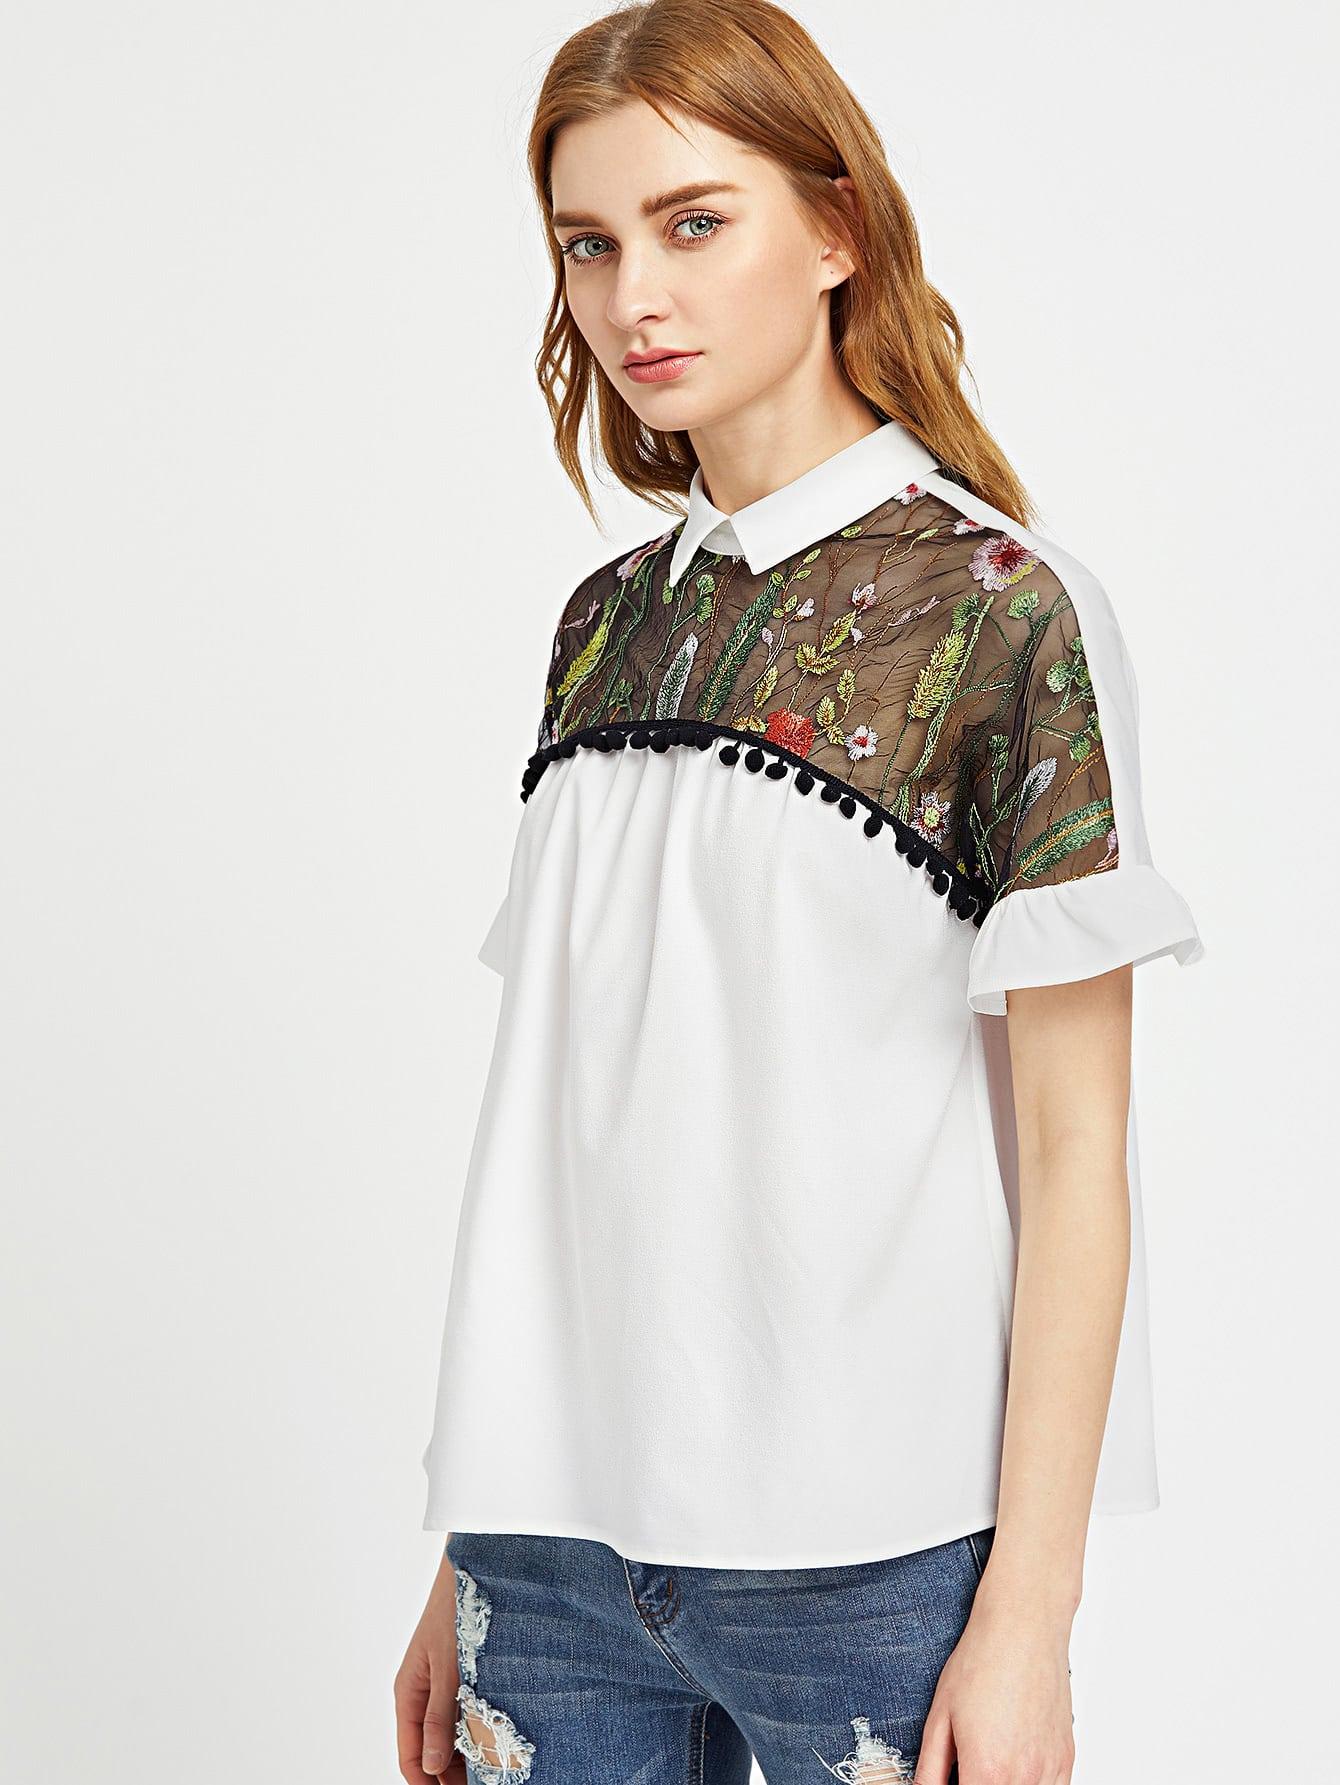 blouse170315702_2